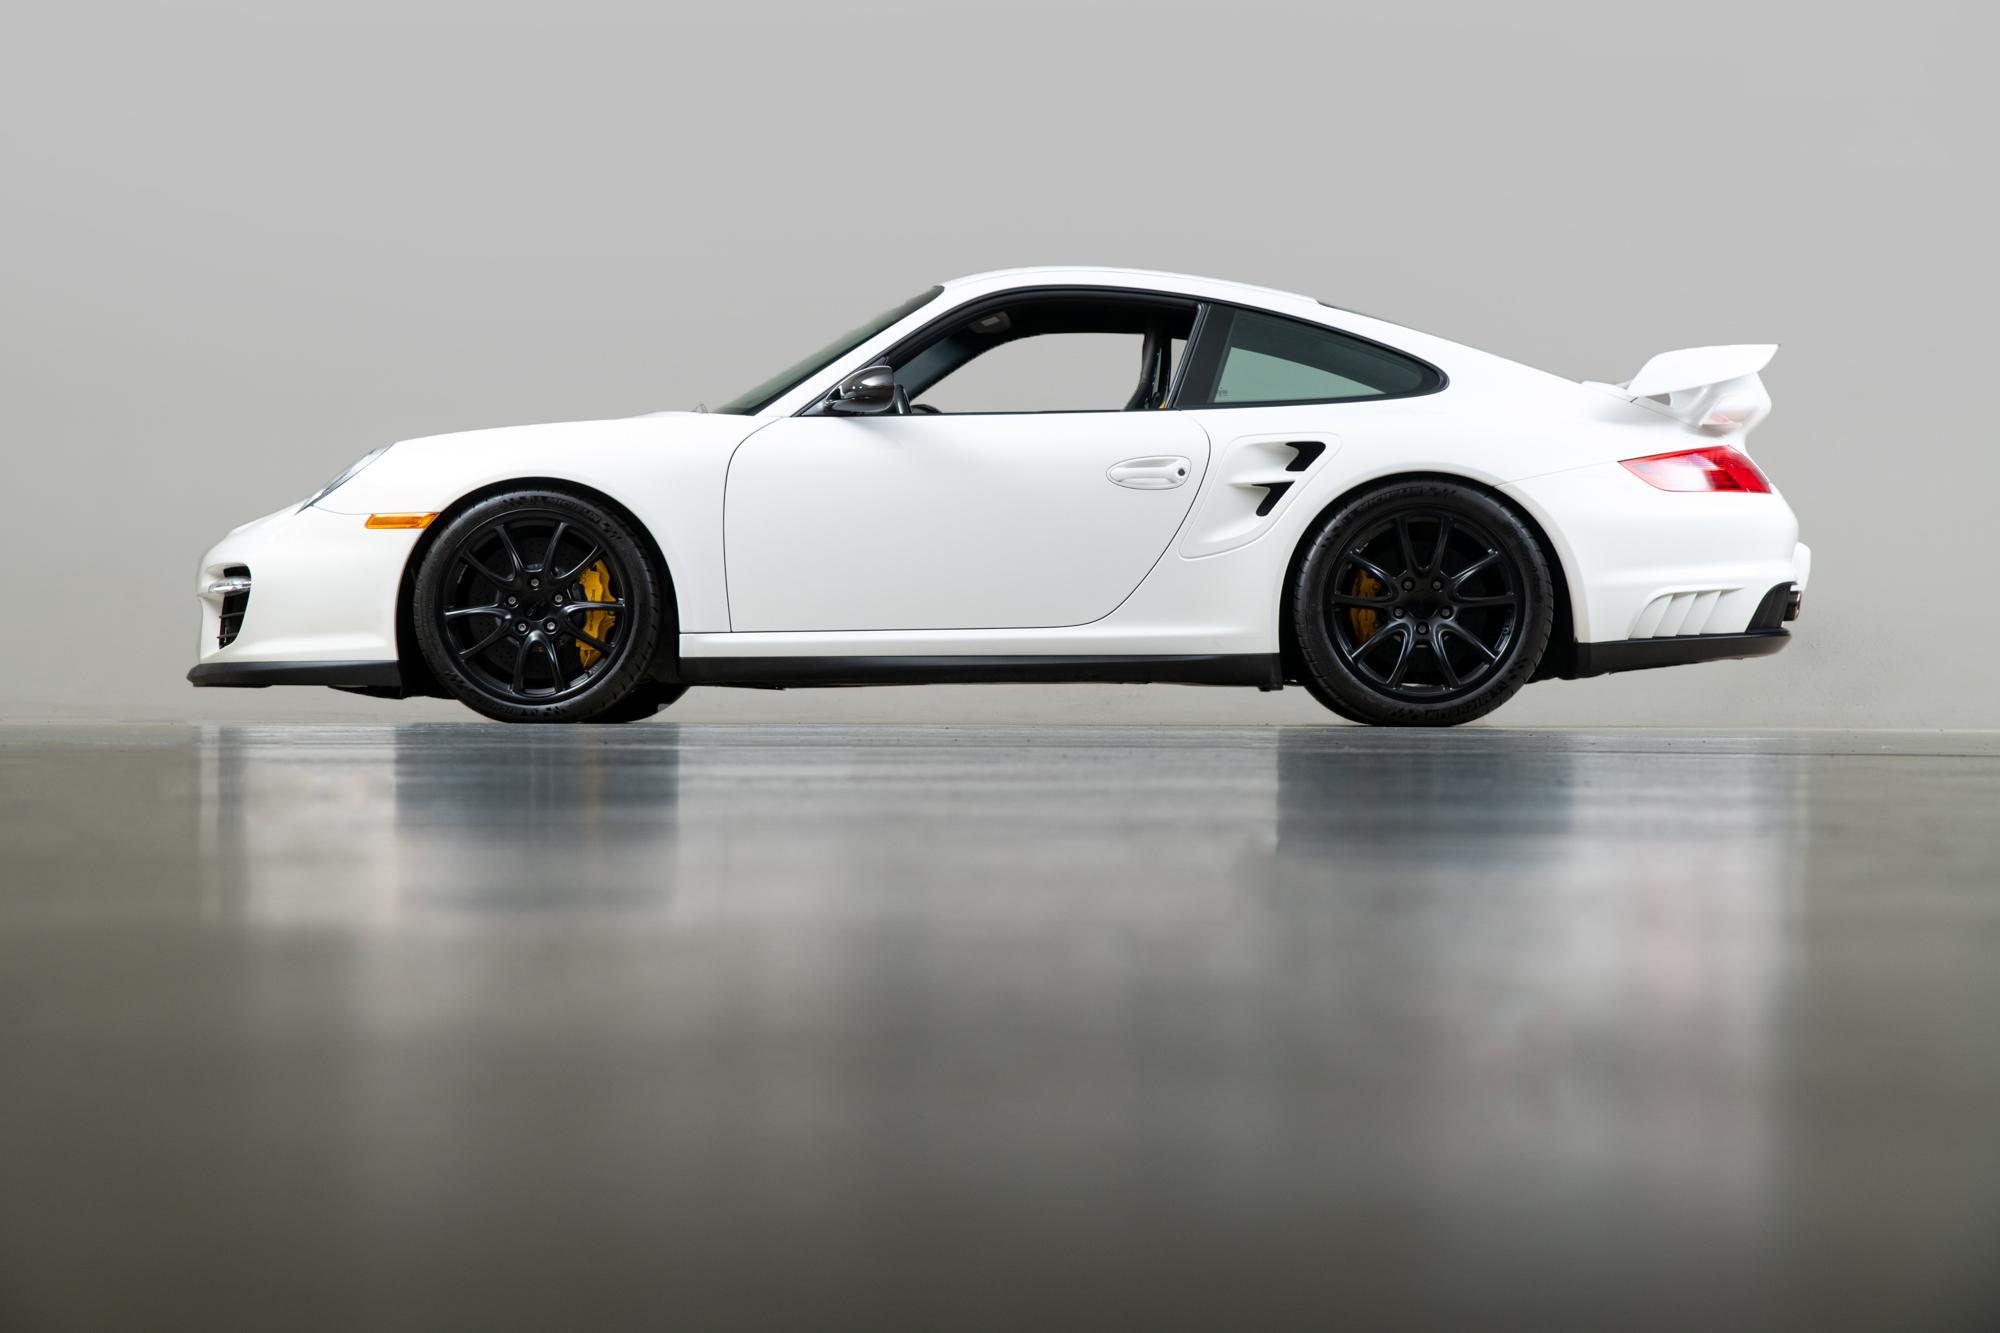 2008 Porsche GT2 , WHITE, VIN WP0AD29928S796255, MILEAGE 6817